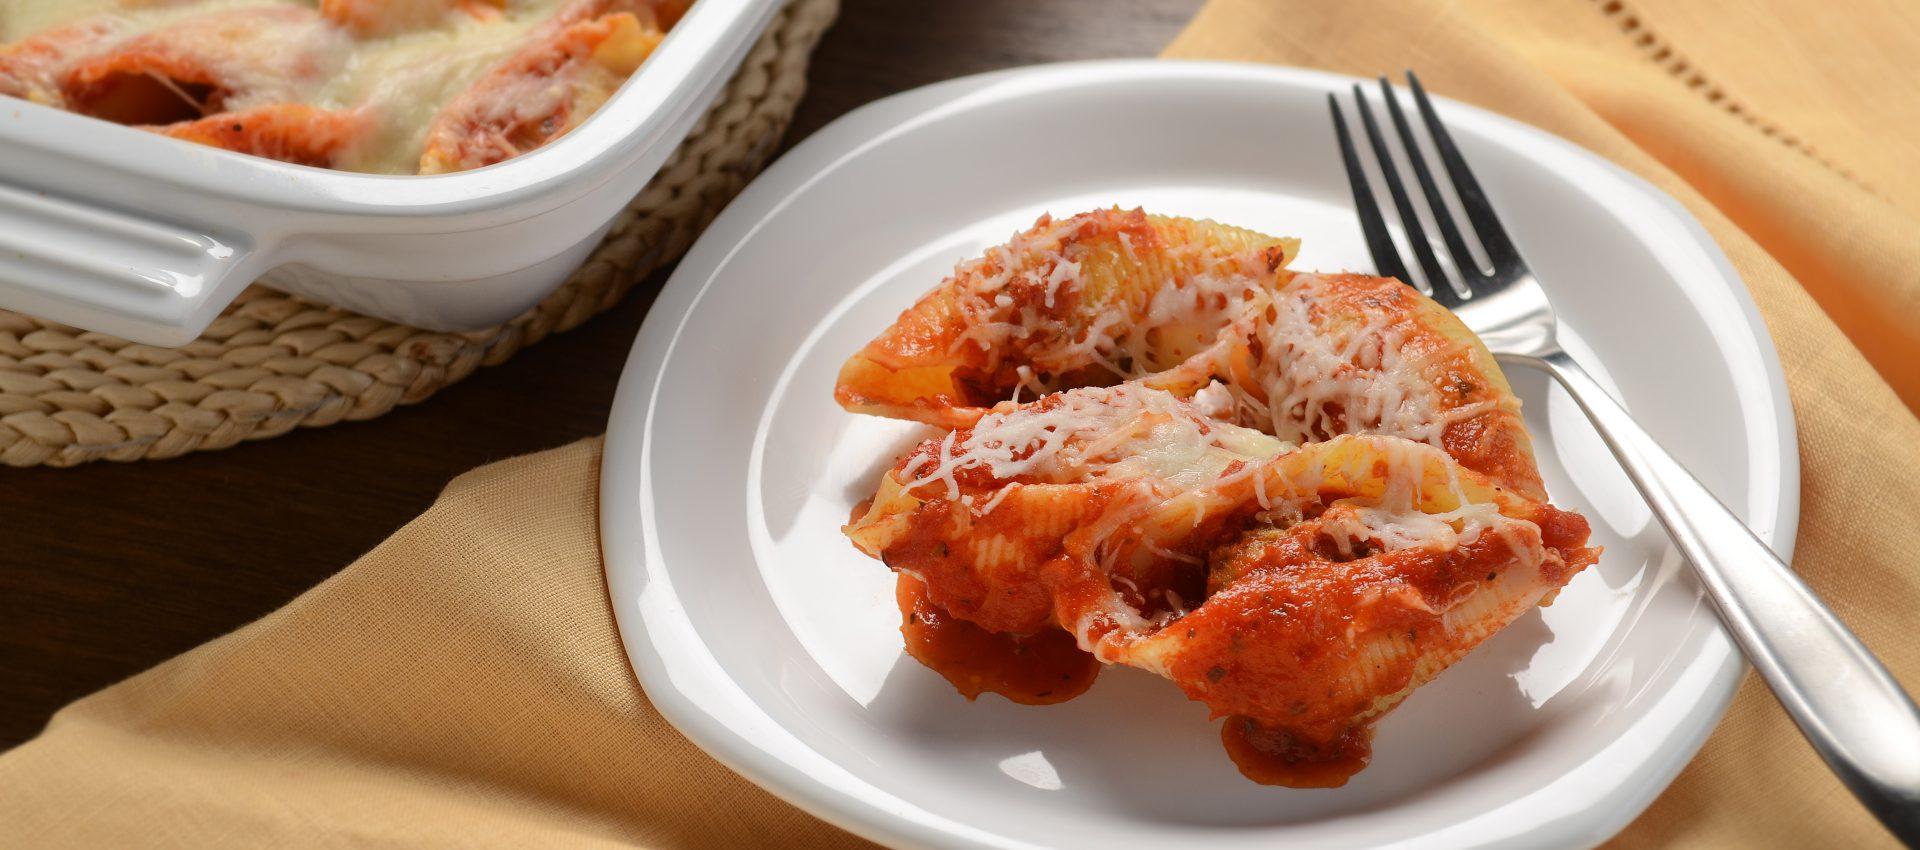 Easy-Italian-Filled-Shells-HR-1920x850 Italian Meatballs in Jumbo Shells